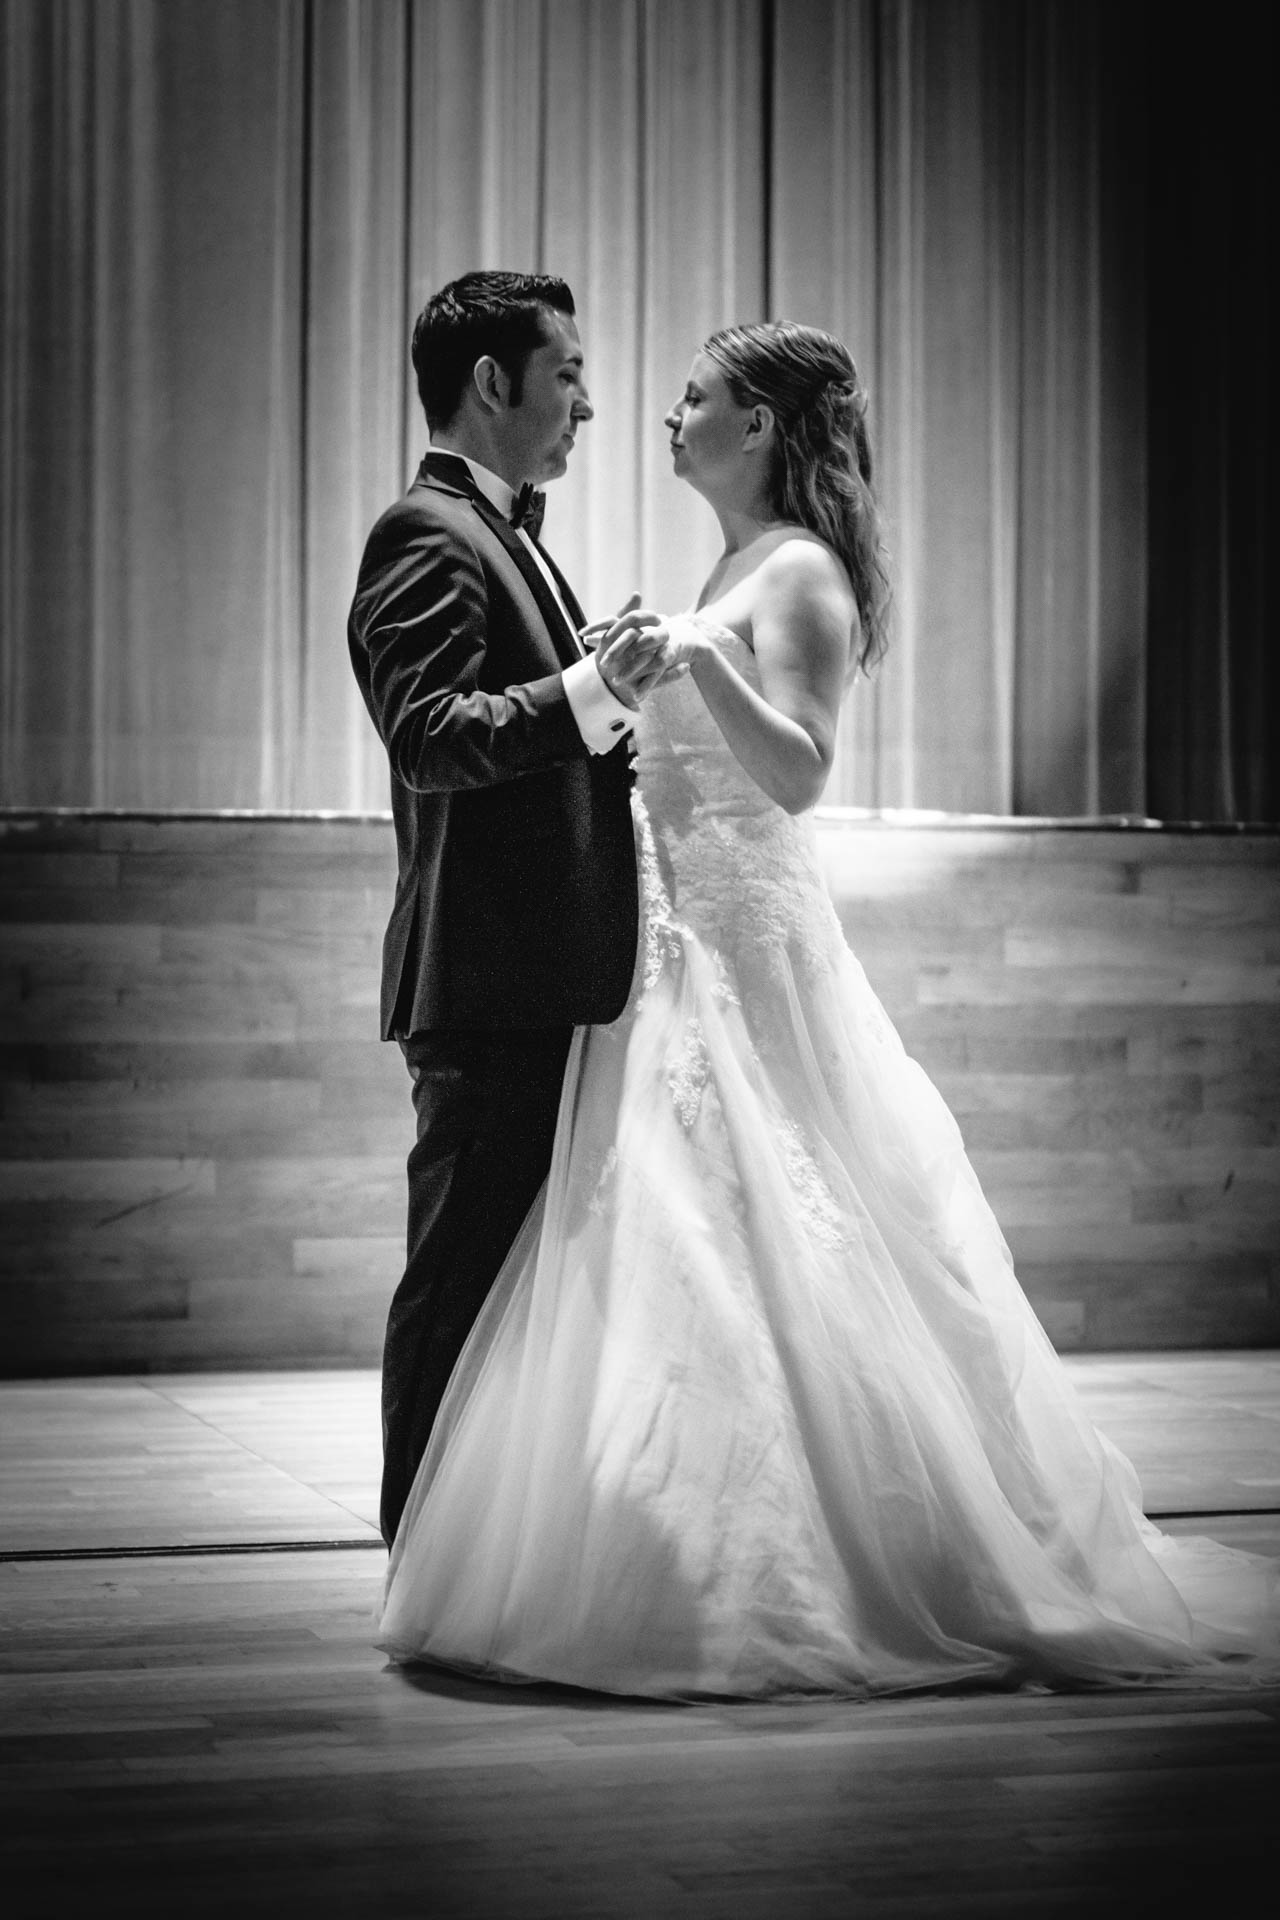 Dana_Michael_Hochzeit_Muttenz_2016-37